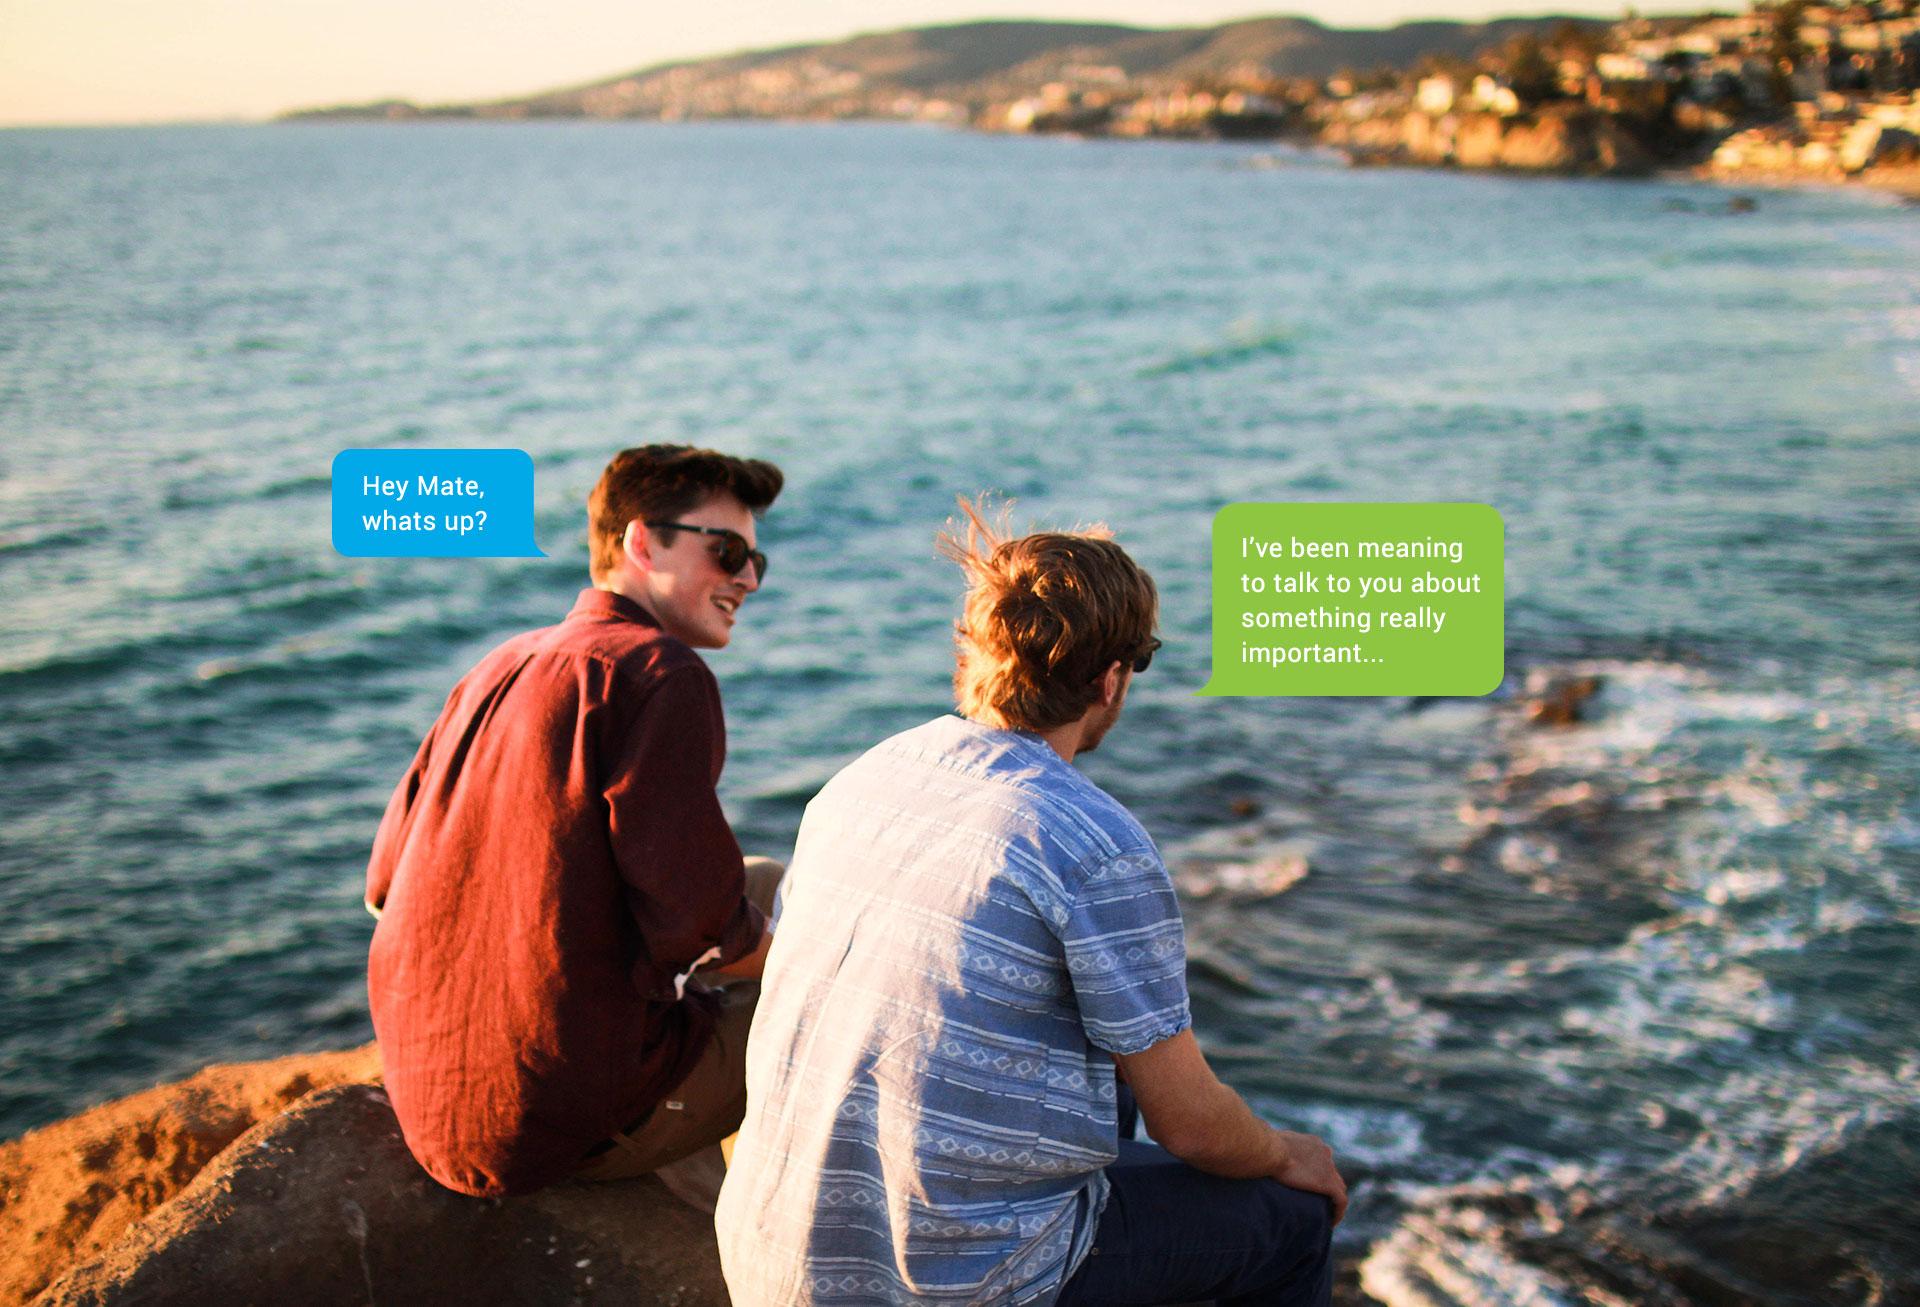 talkward-conversation.jpg